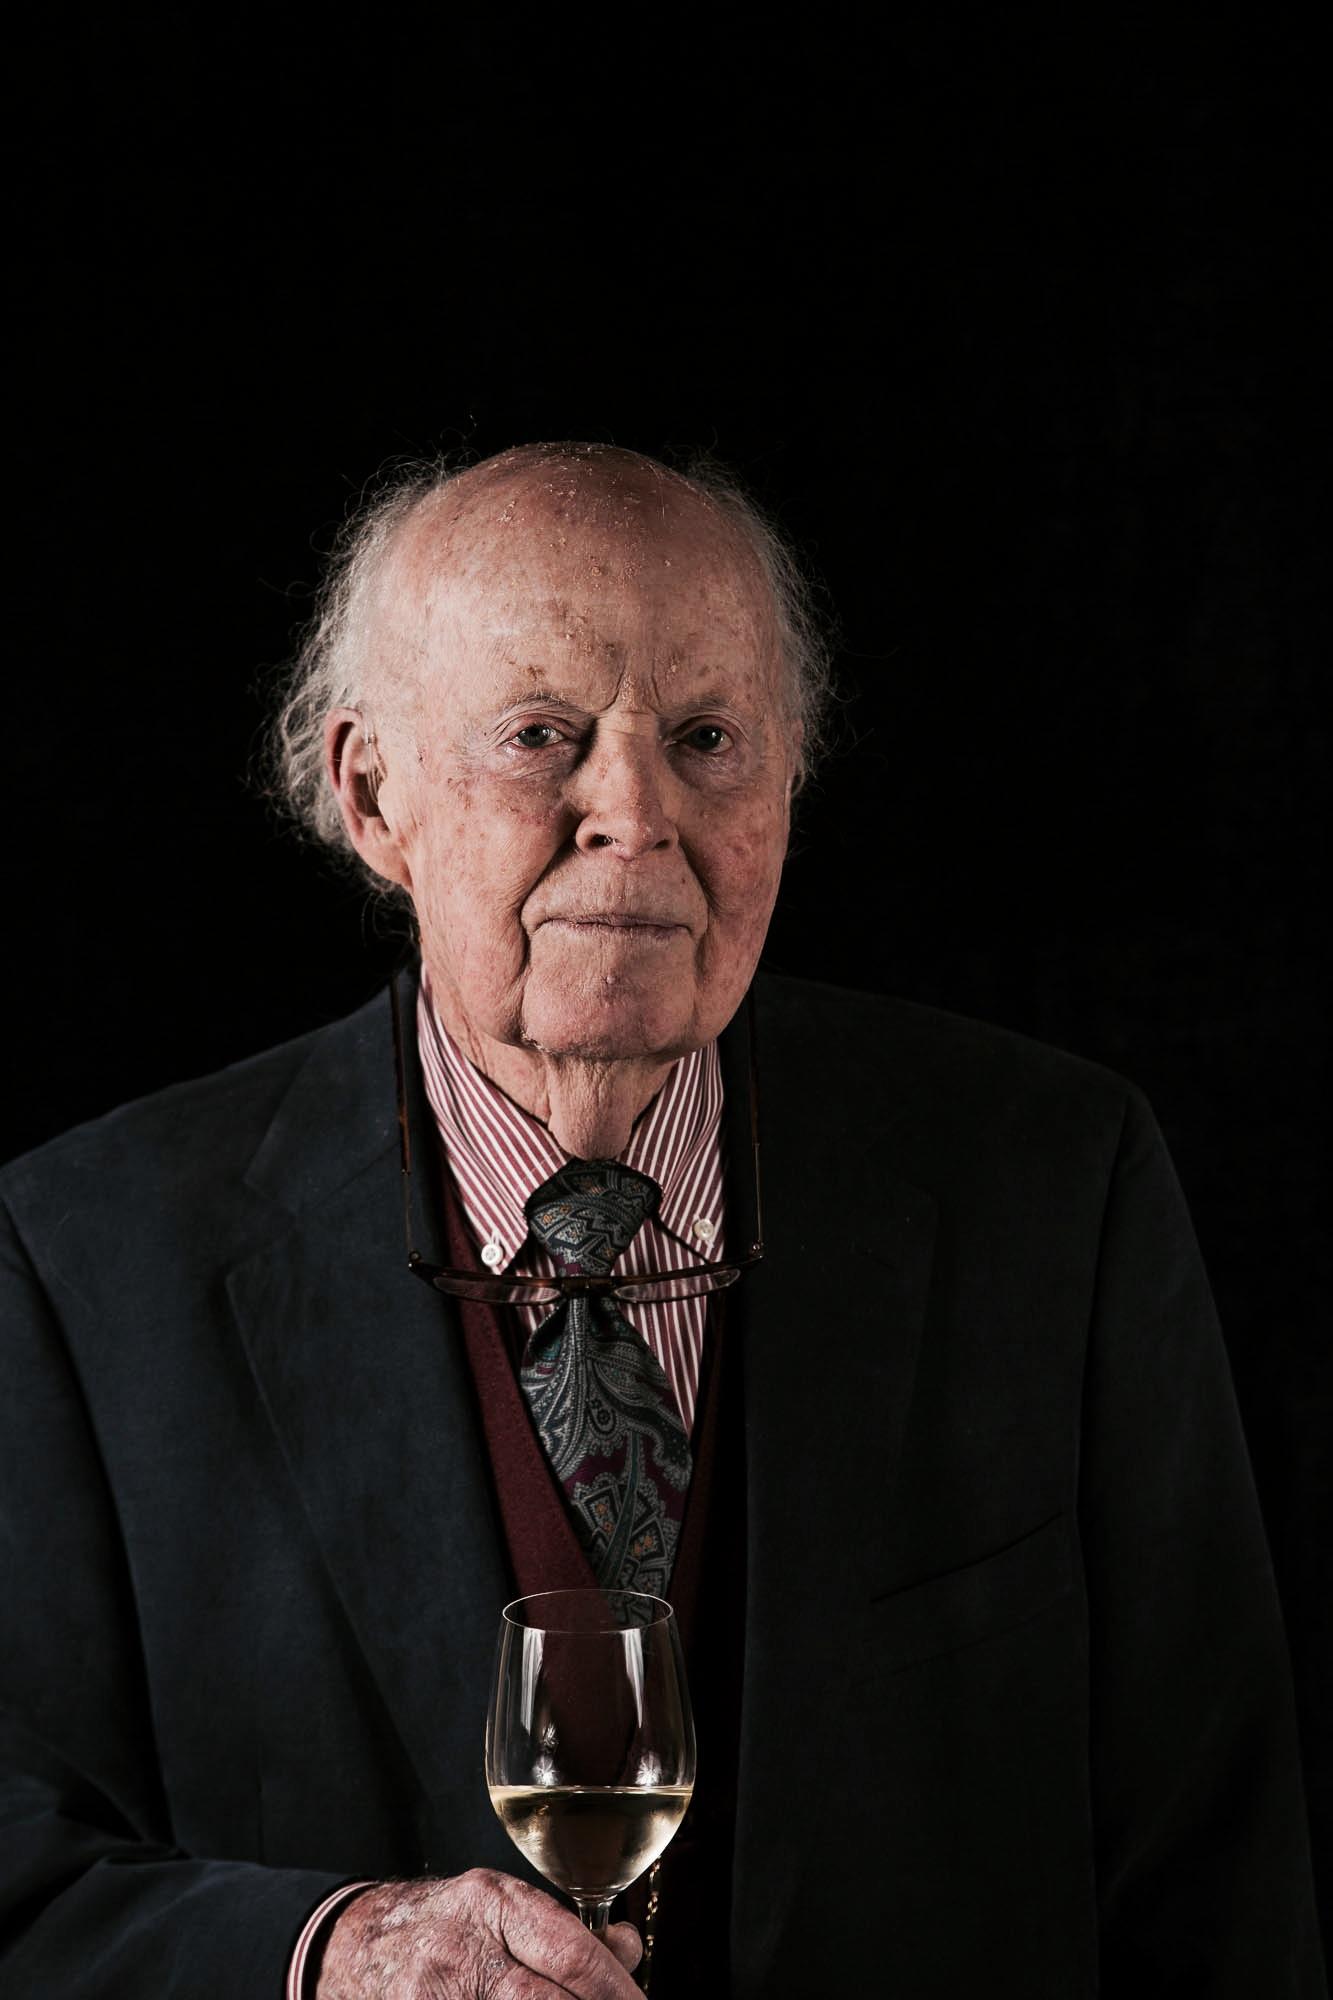 Davis Bynum, Winemaker on his 90th birthday.